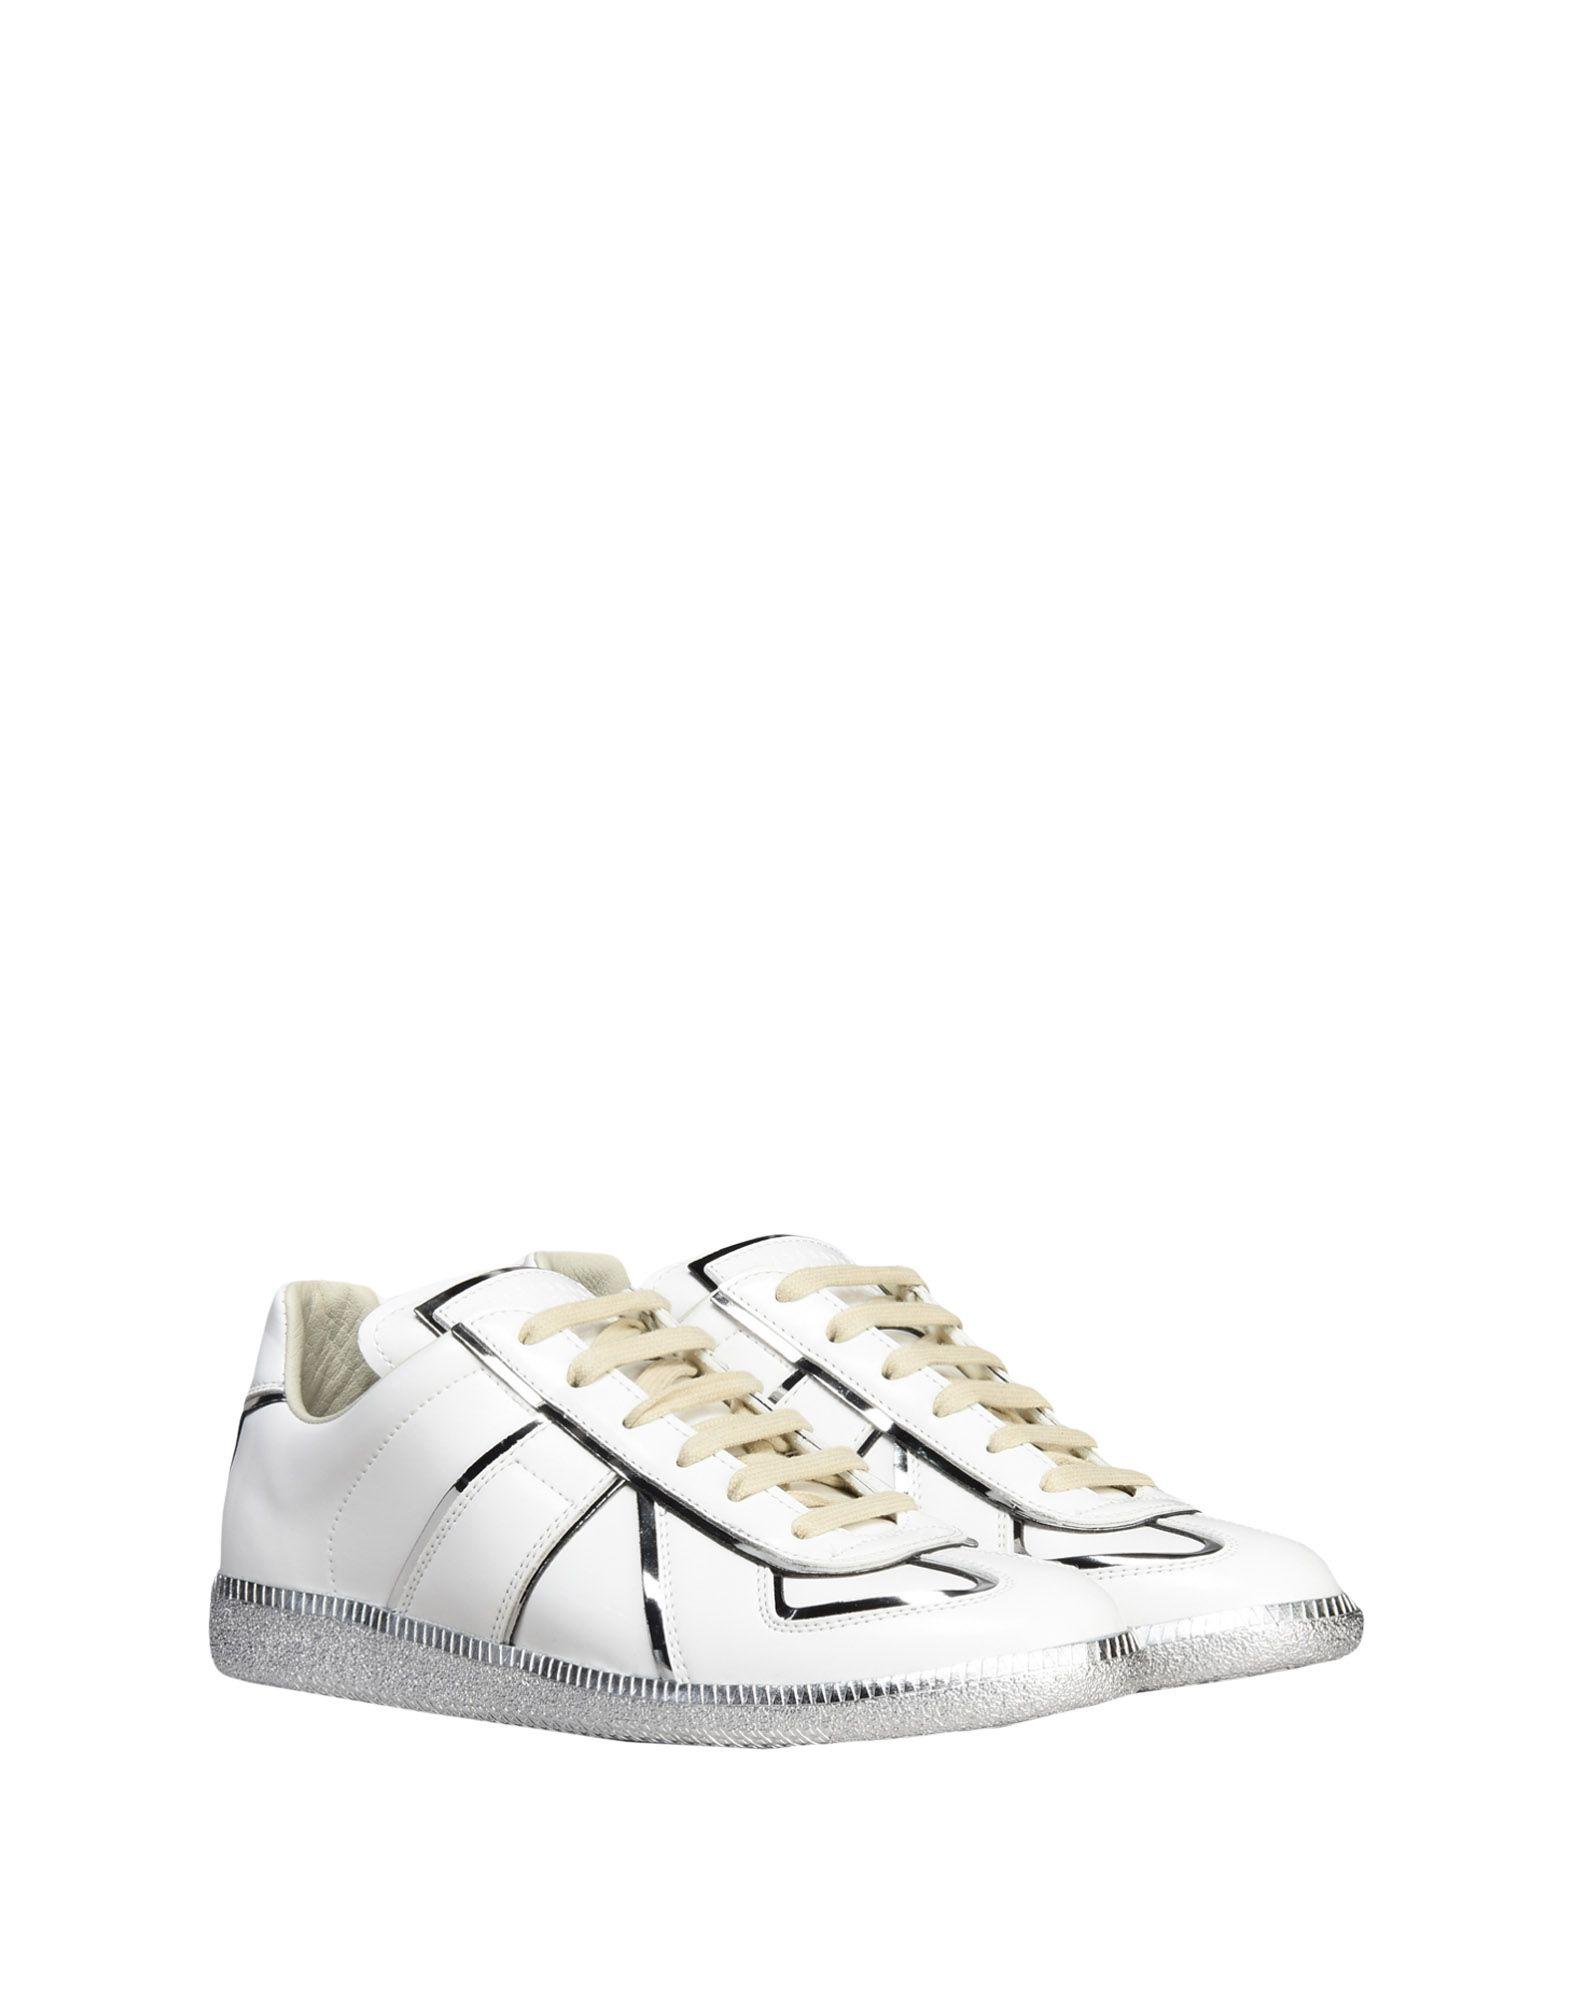 Maison Margiela Sneakers Damen  11314967CNGünstige gut aussehende Schuhe